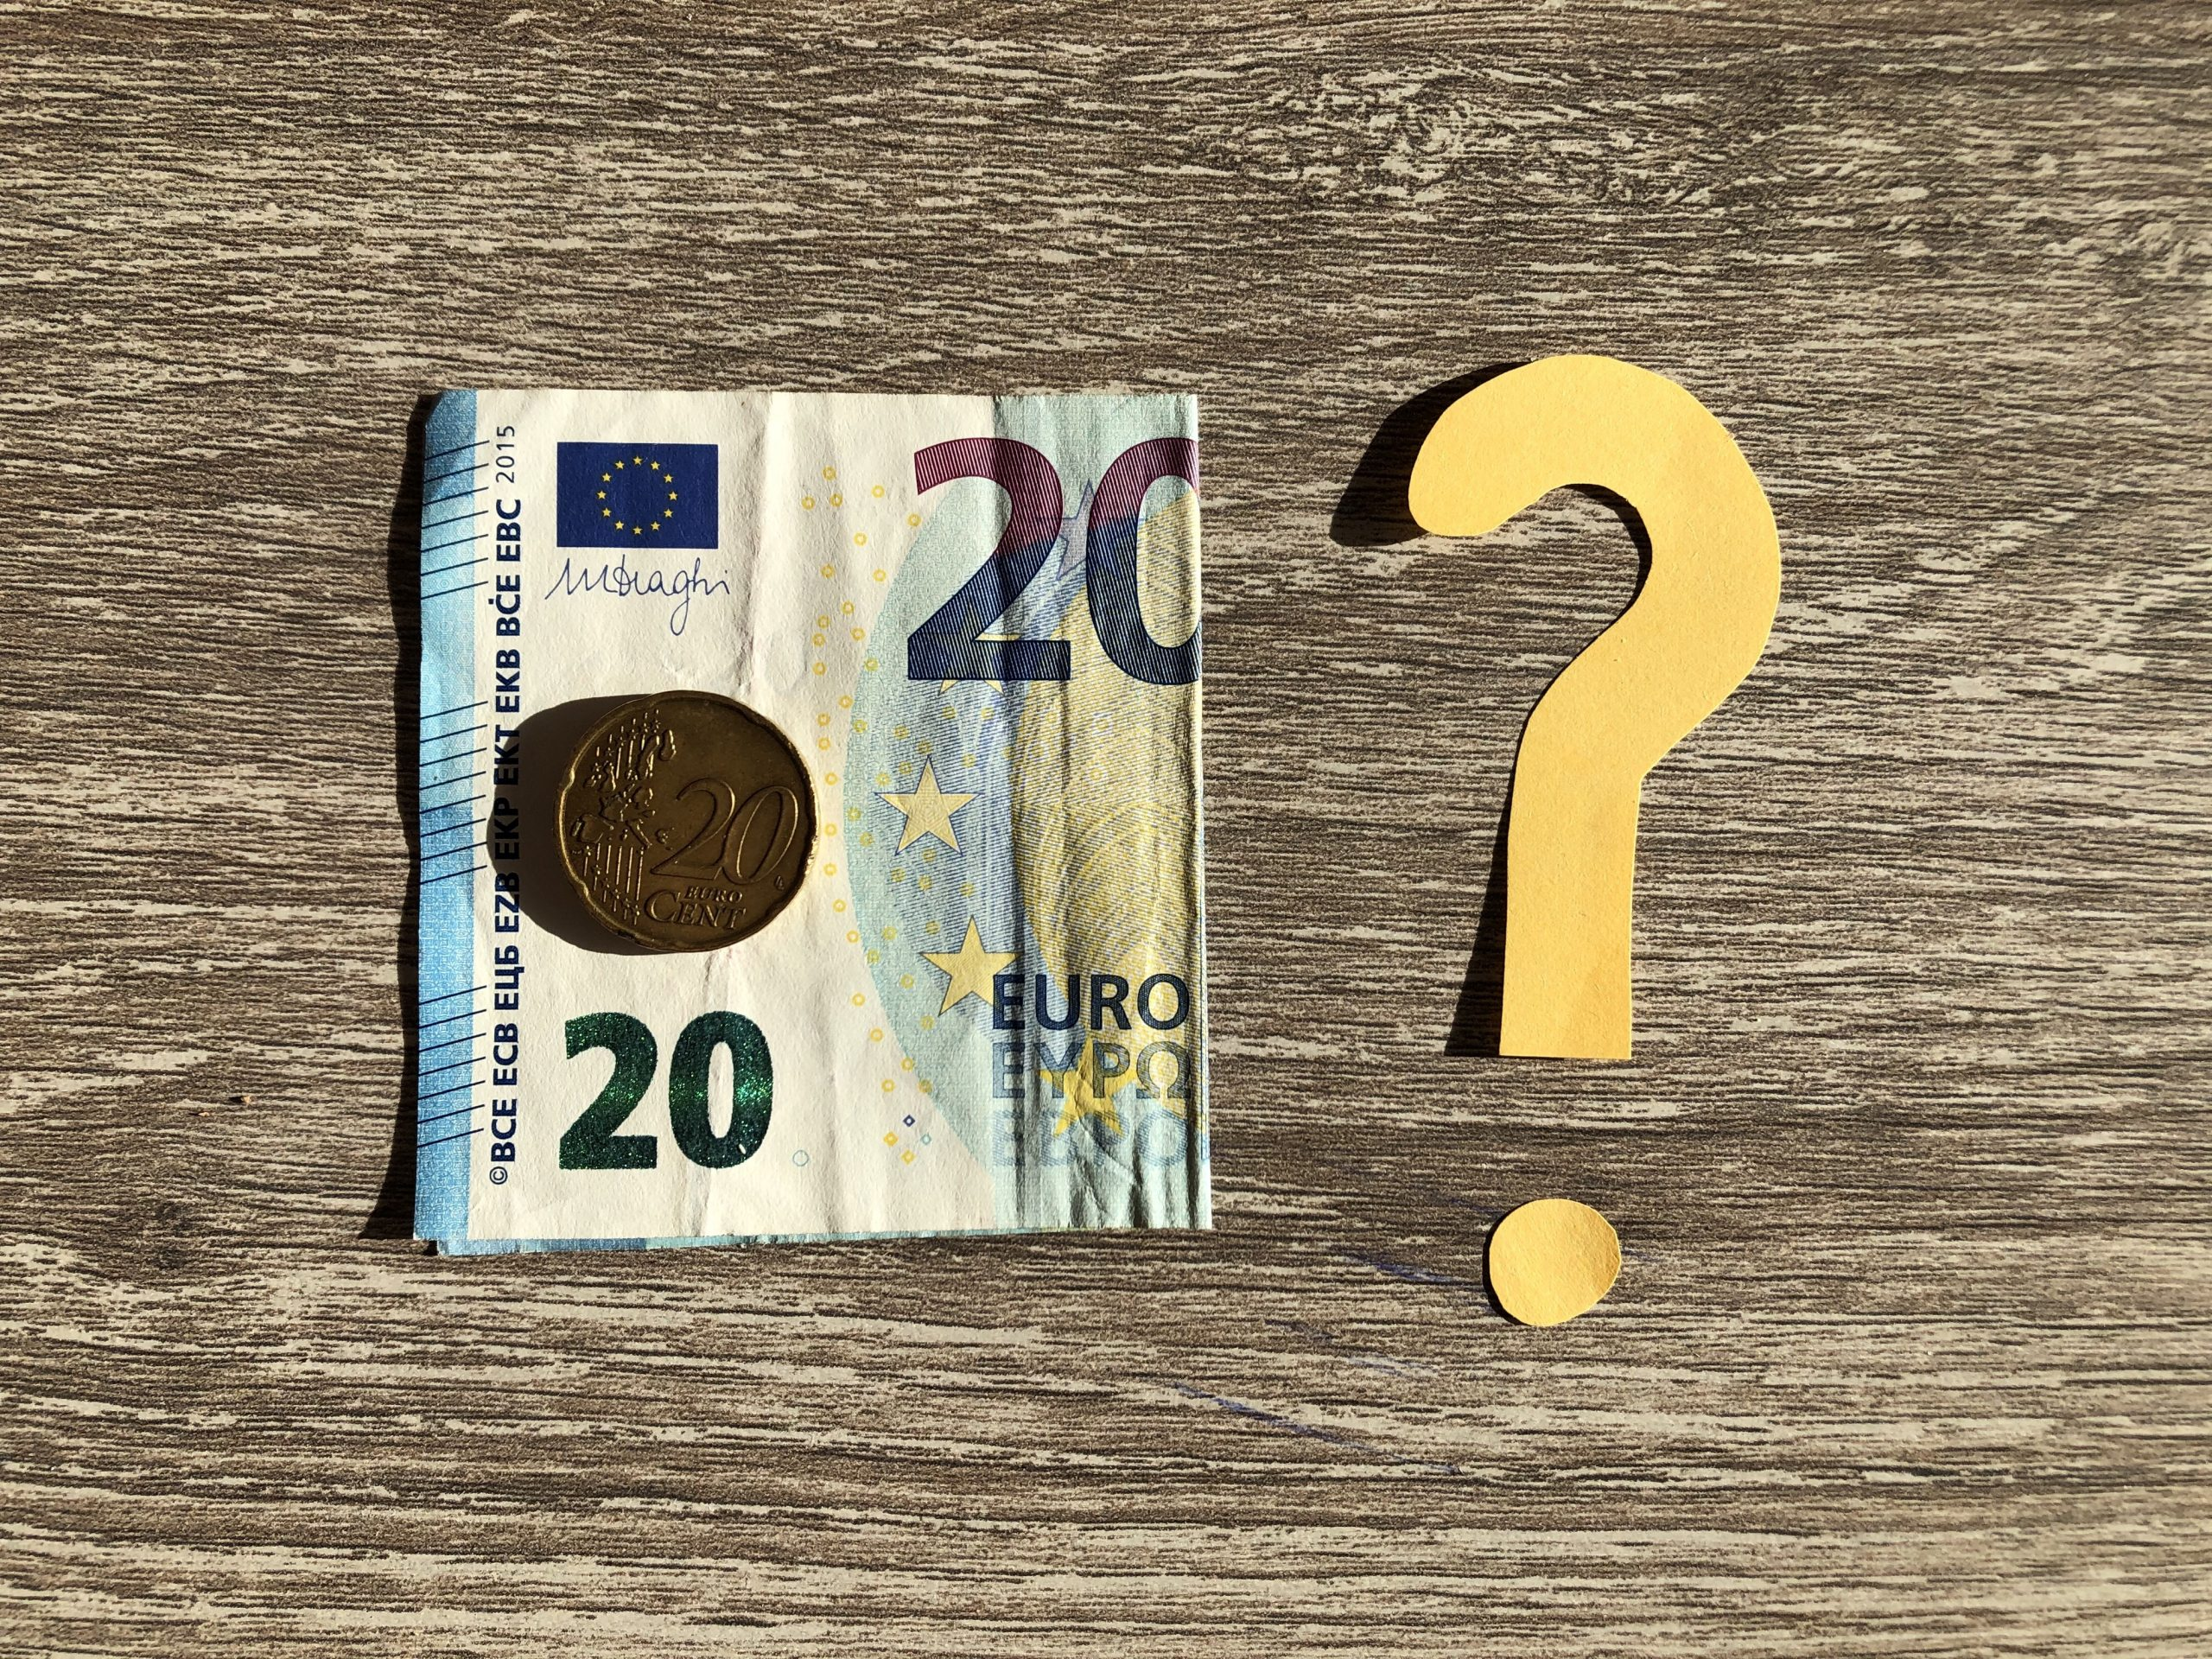 Bestemming 20,20 euro